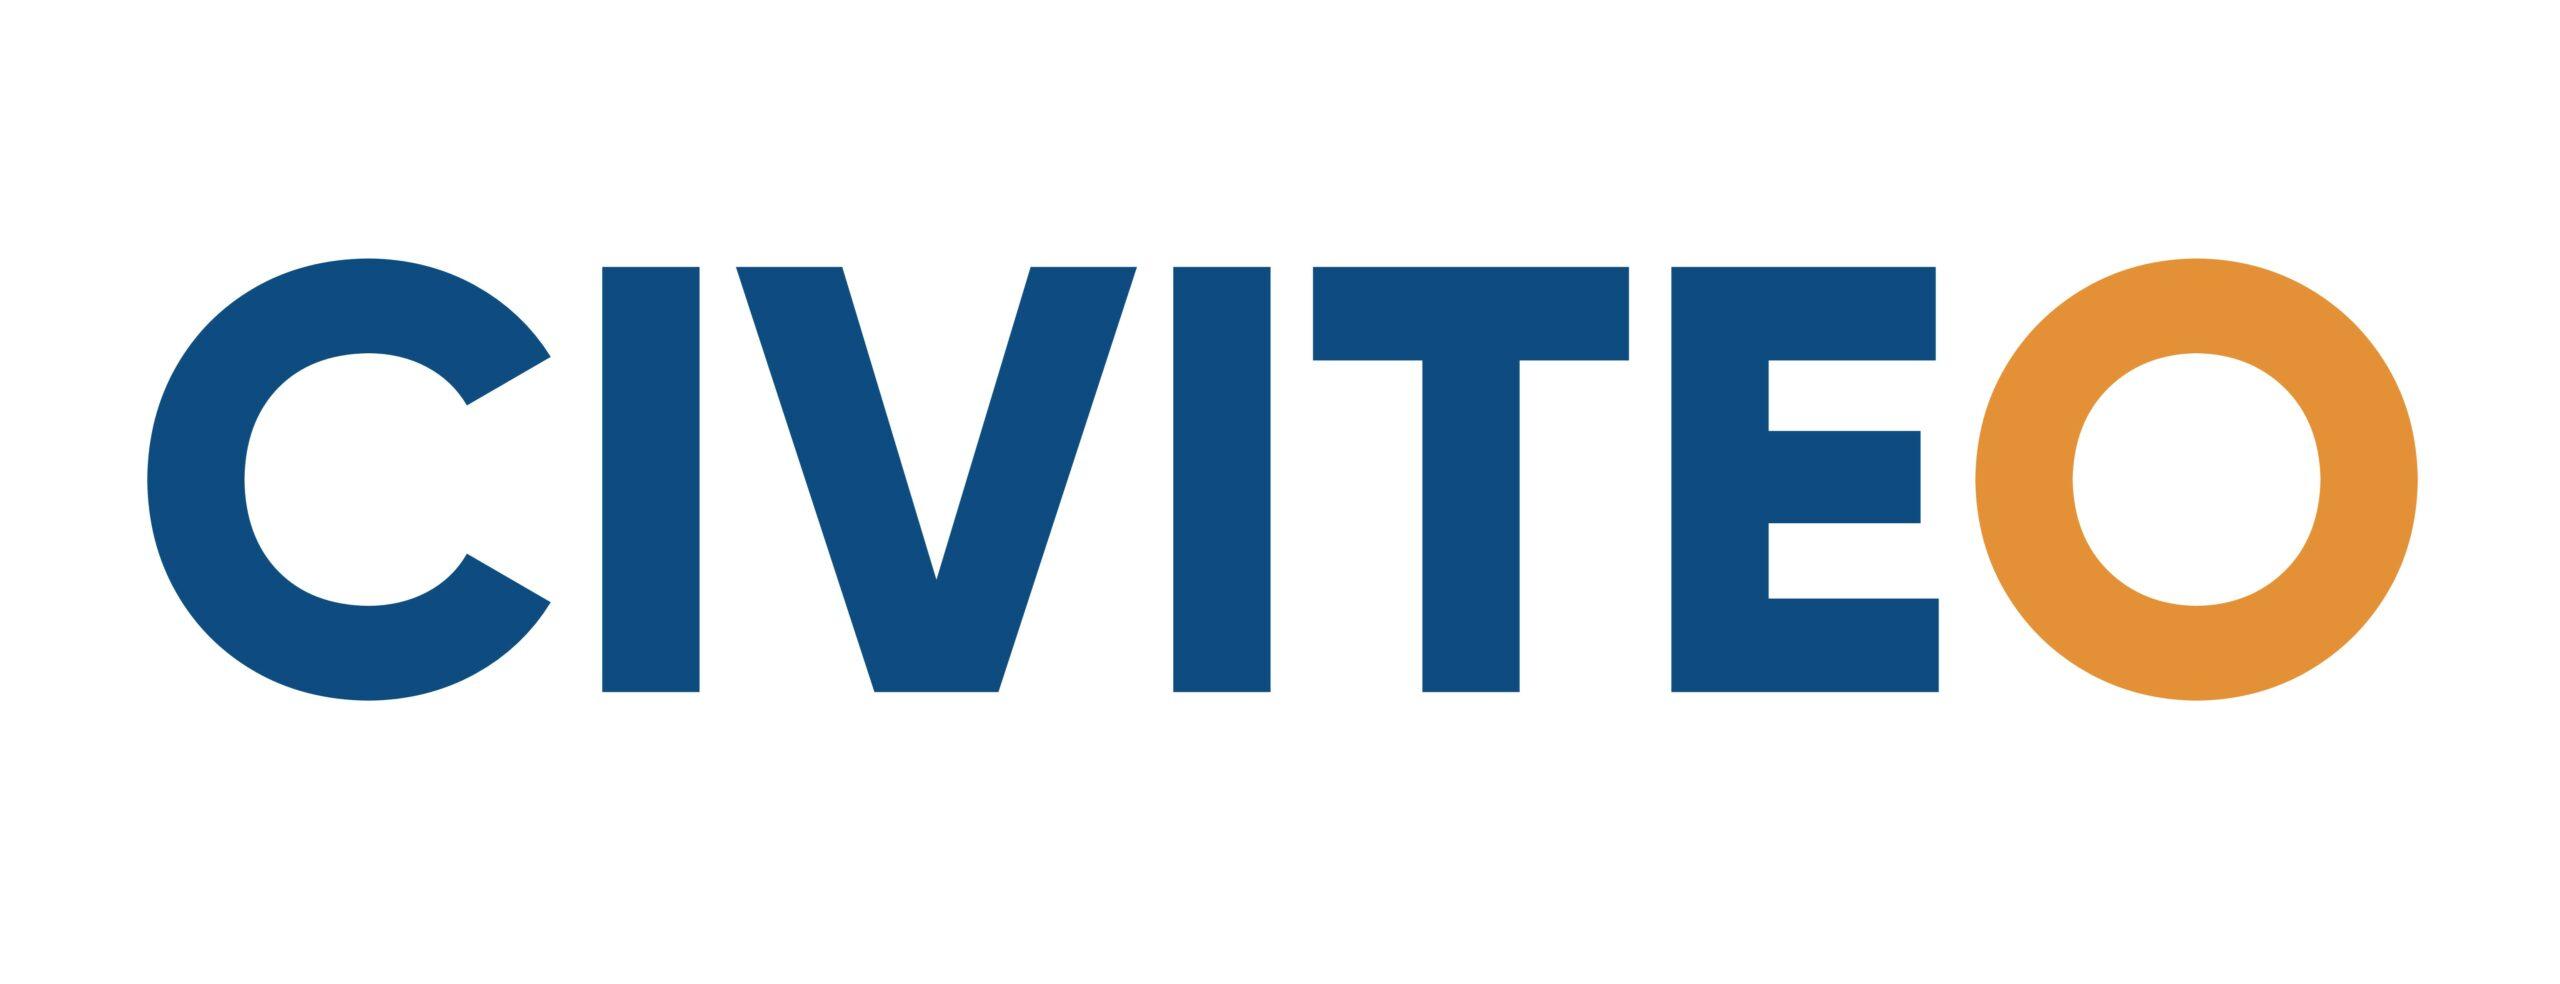 logo CIVITEO